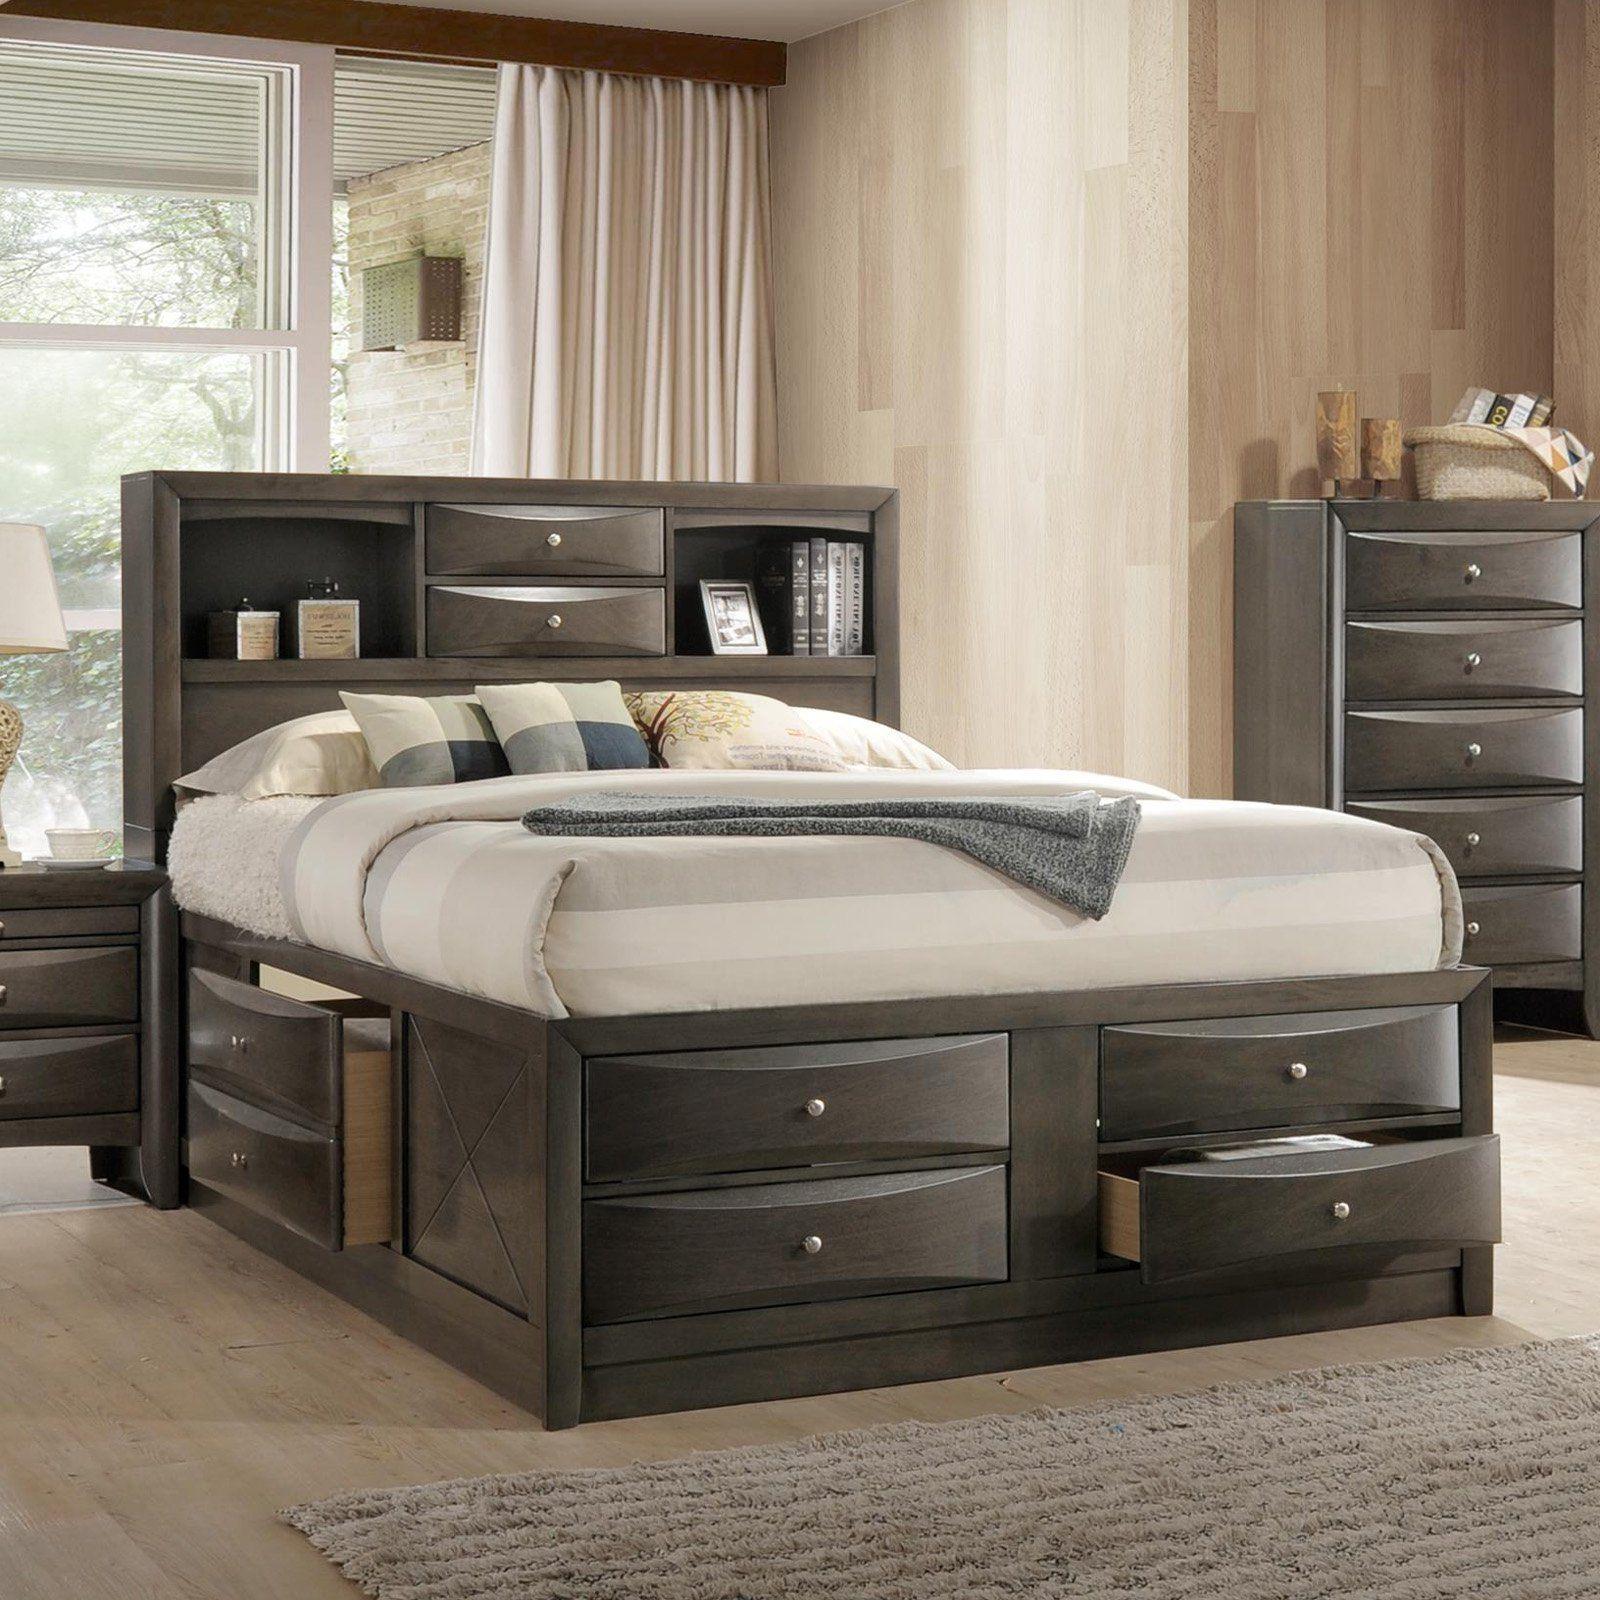 Acme Furniture Ireland Platform Bed in 2020 Storage bed